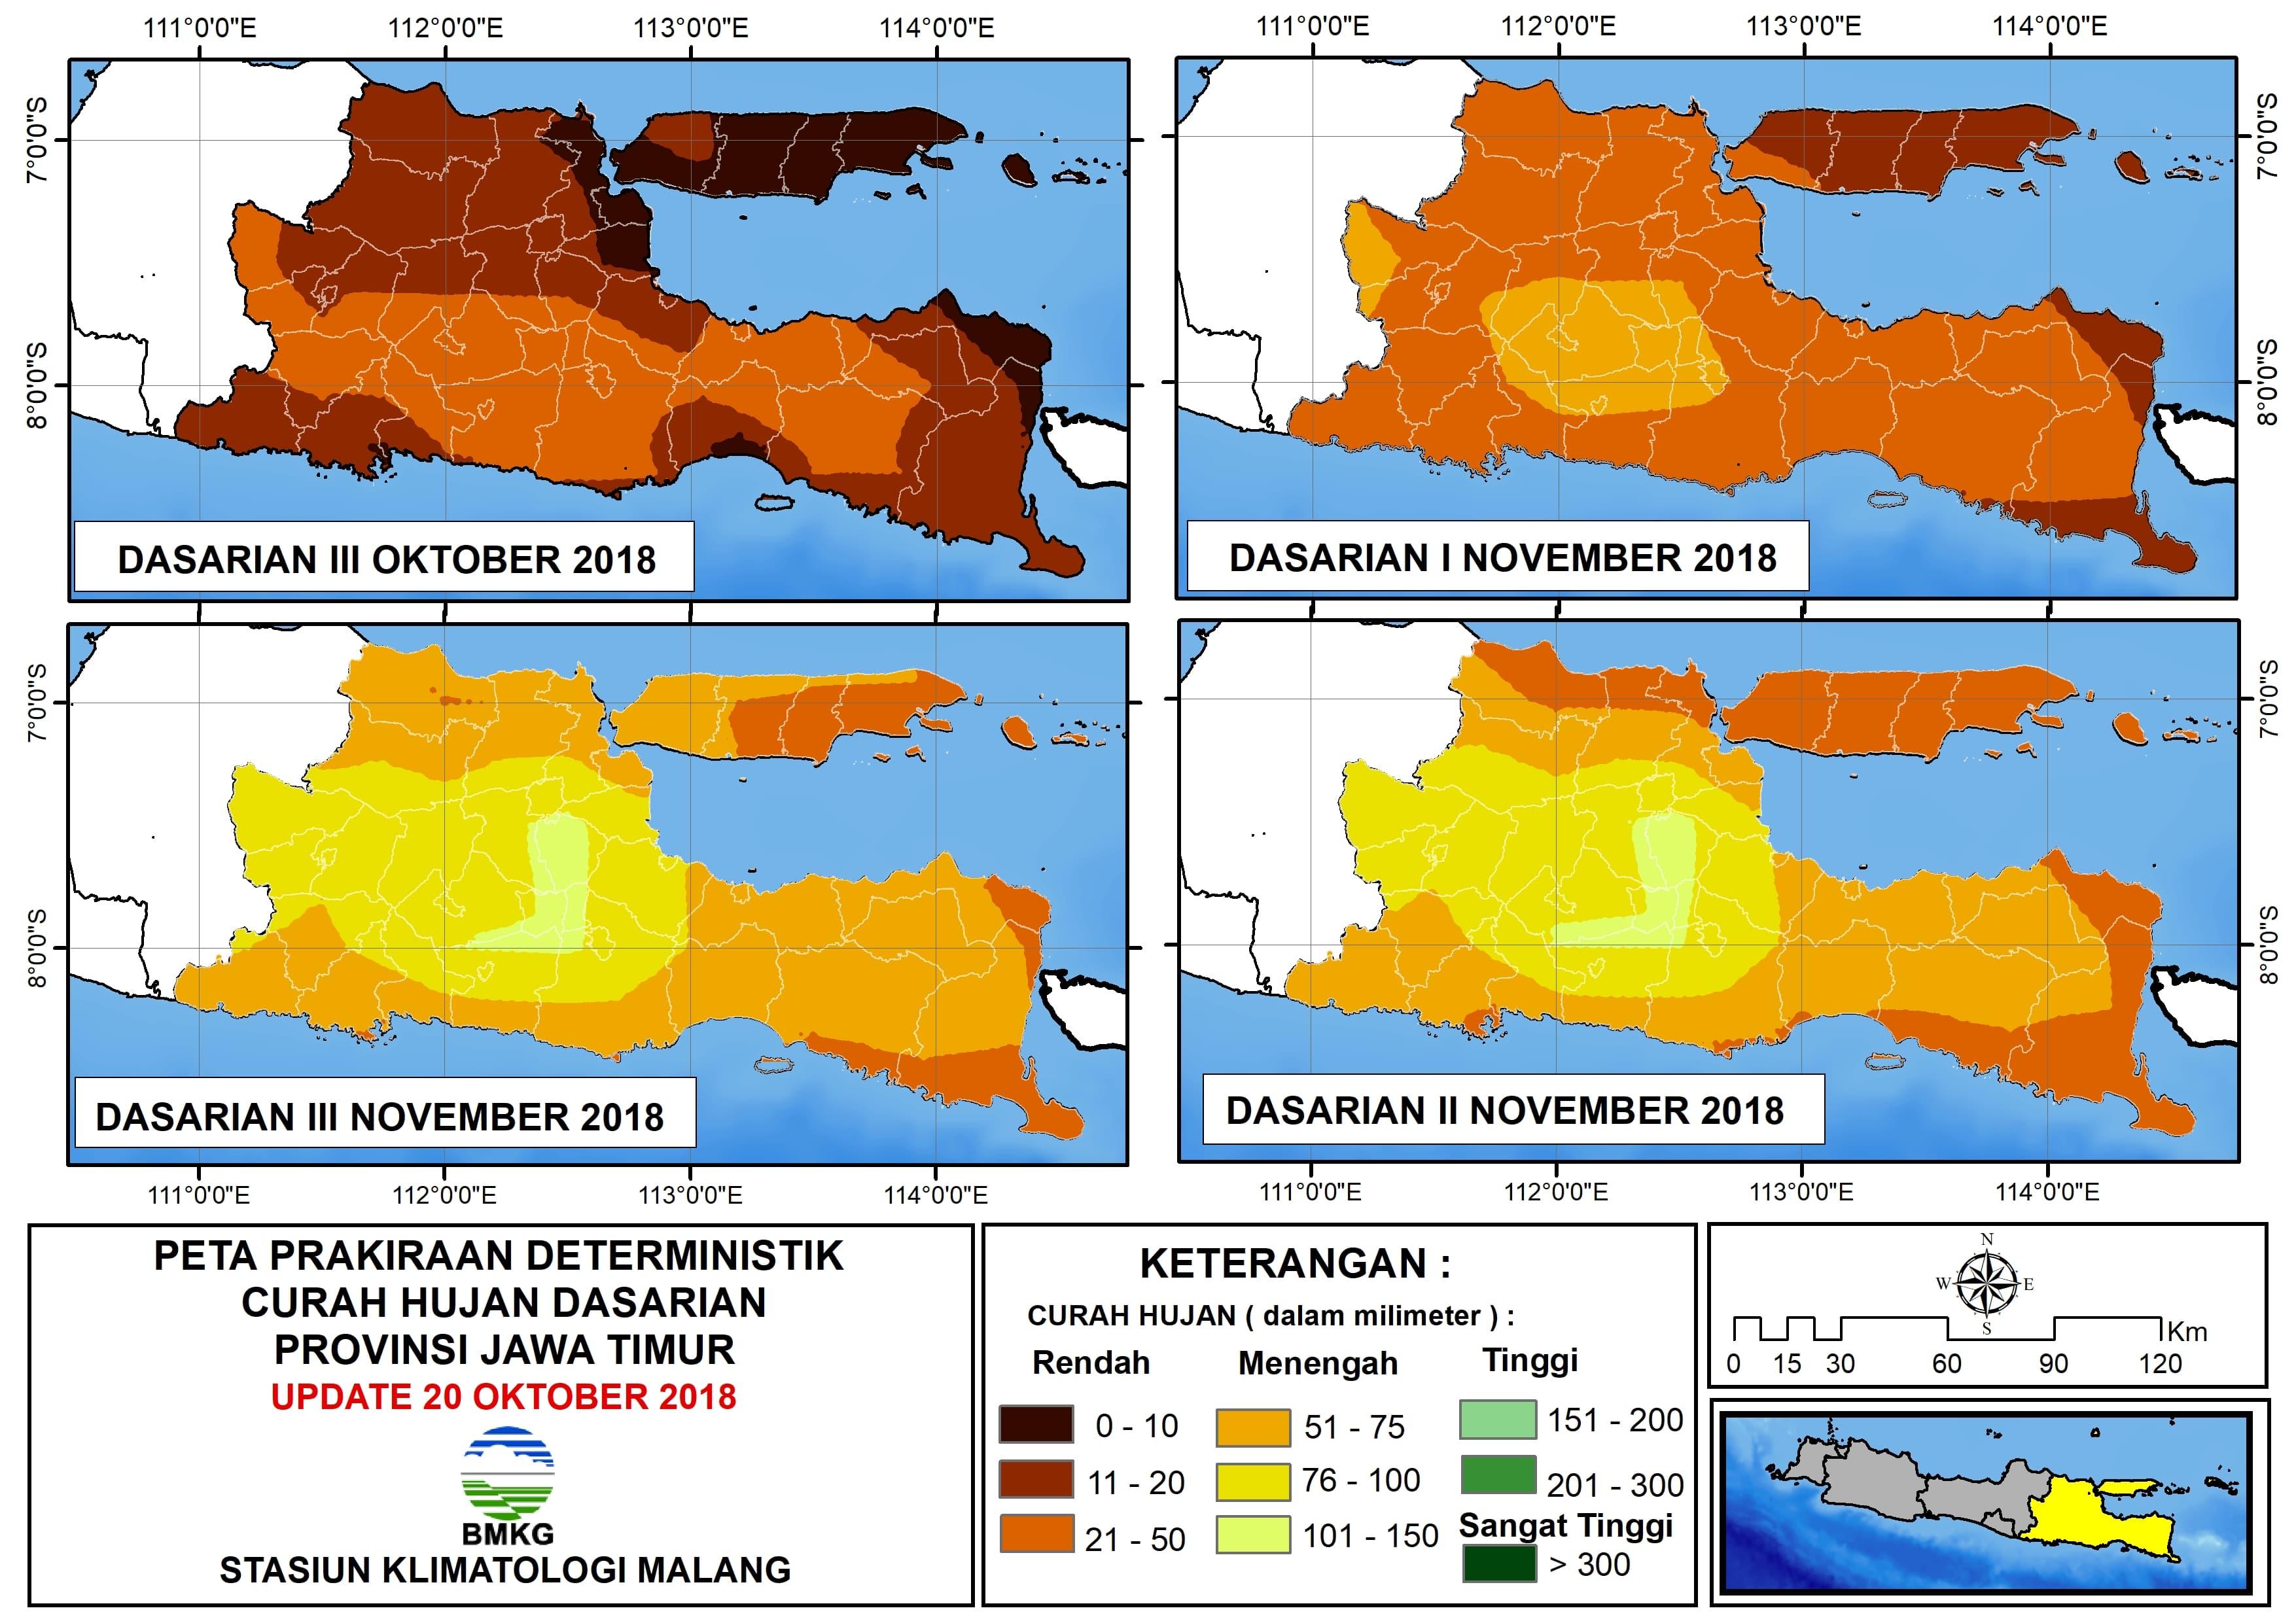 Prakiraan Deterministik Curah Hujan Dasarian III Provinsi Jawa Timur Update 20 Oktober 2018